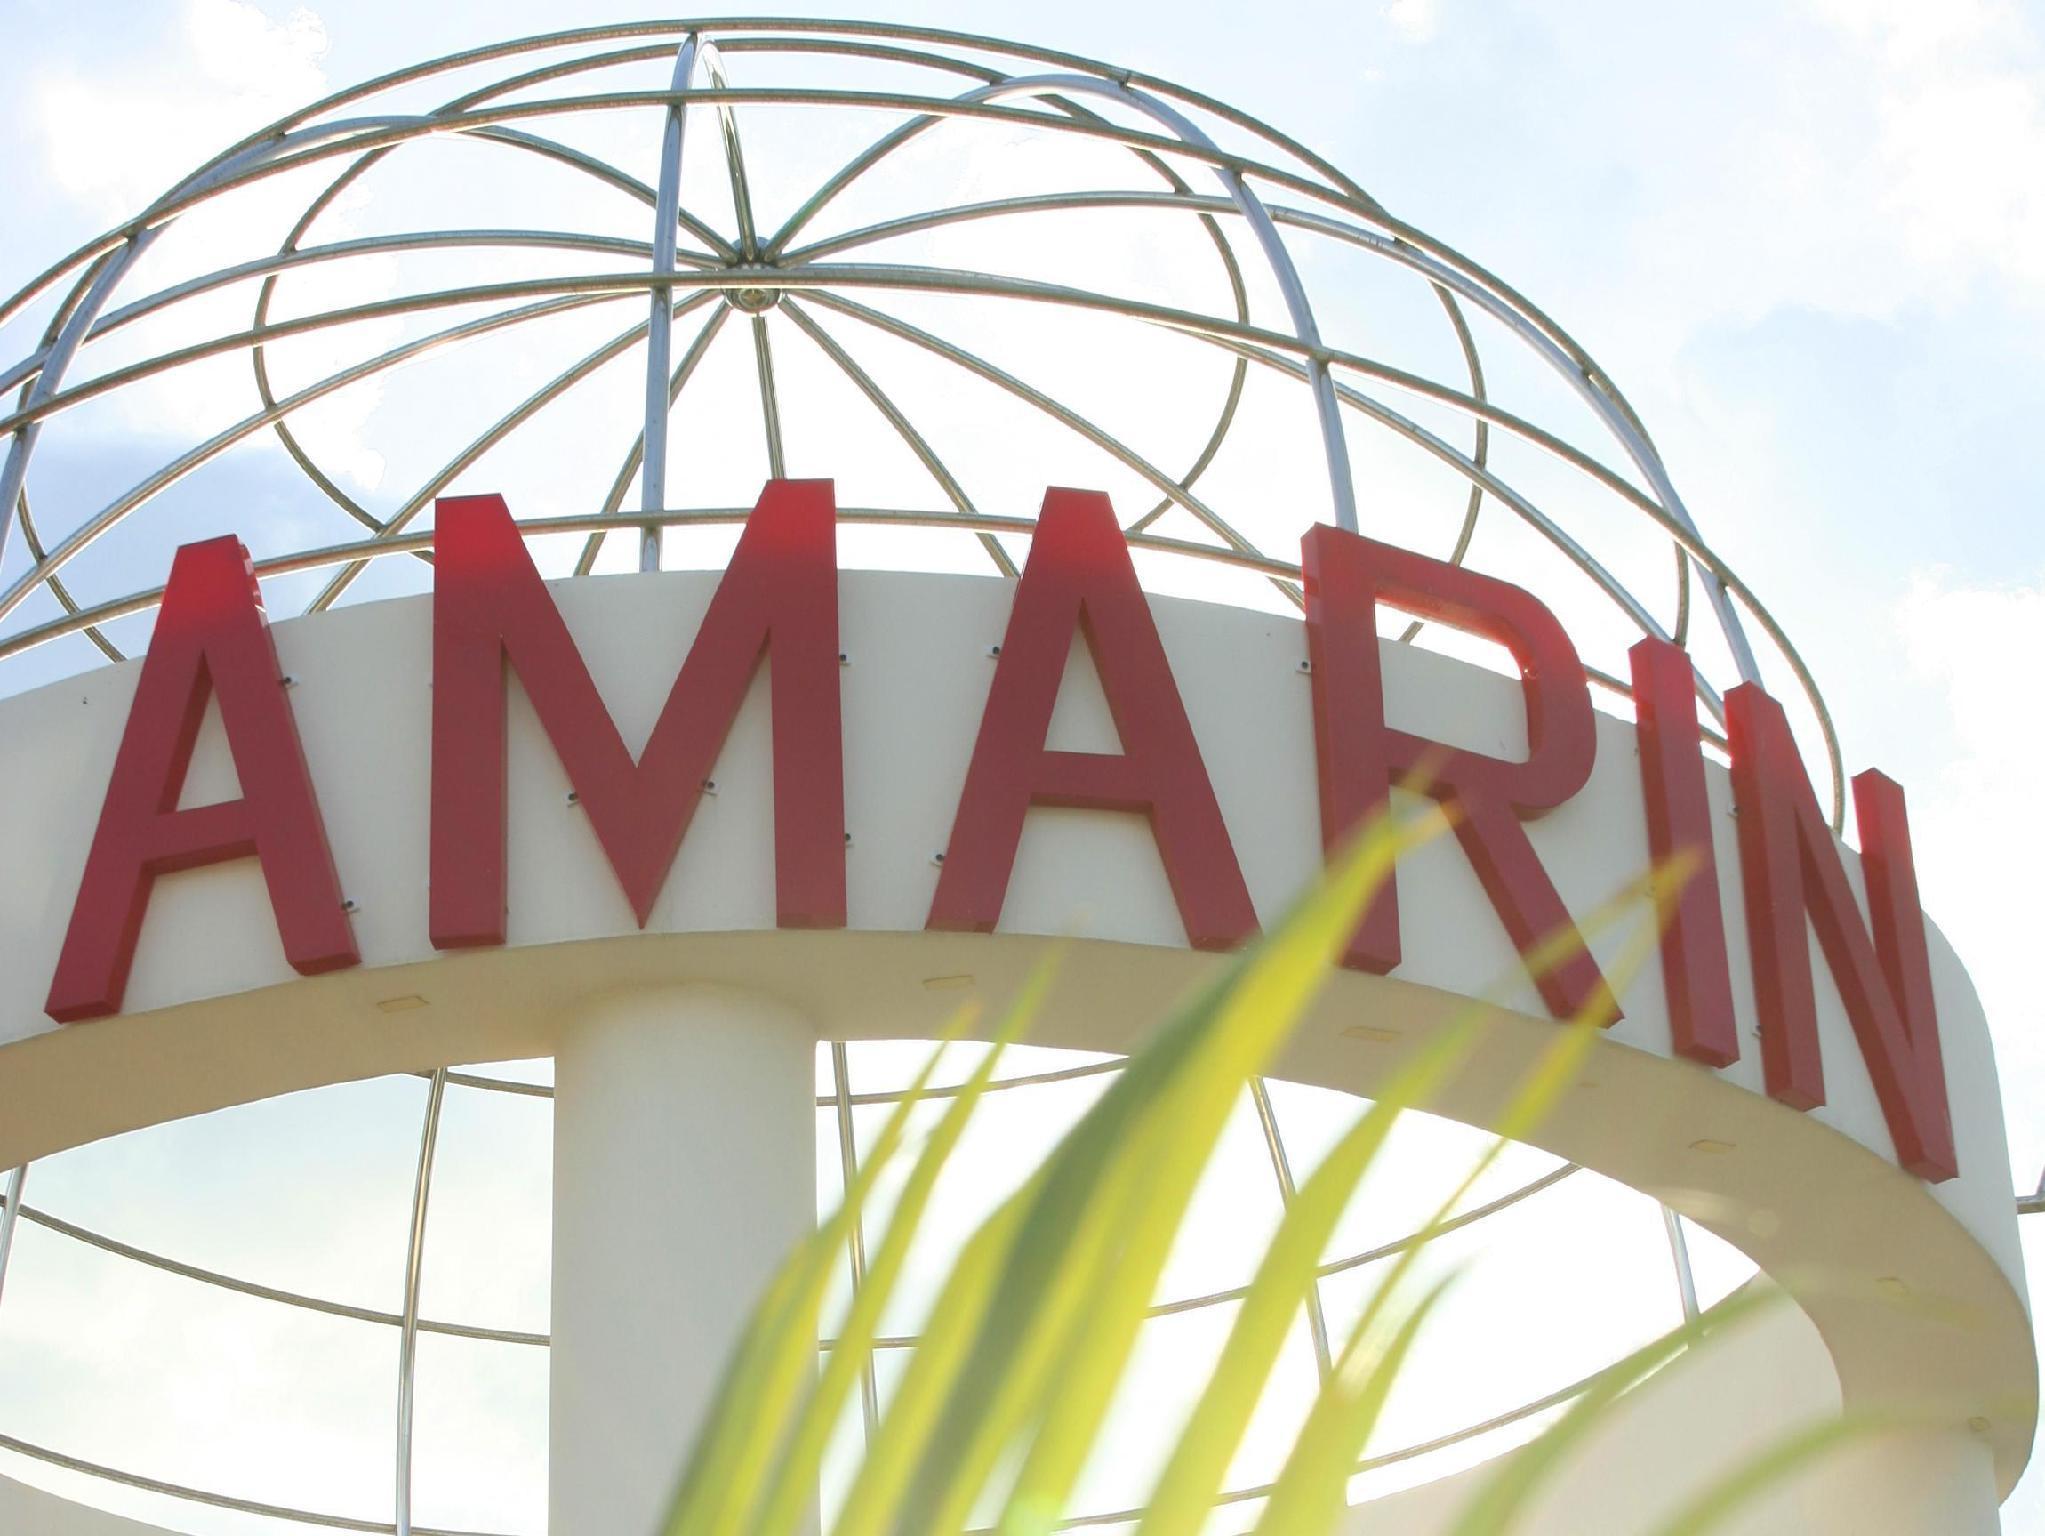 Amarin Samui Hotel โรงแรมอมรินทร์ เกาะสมุย